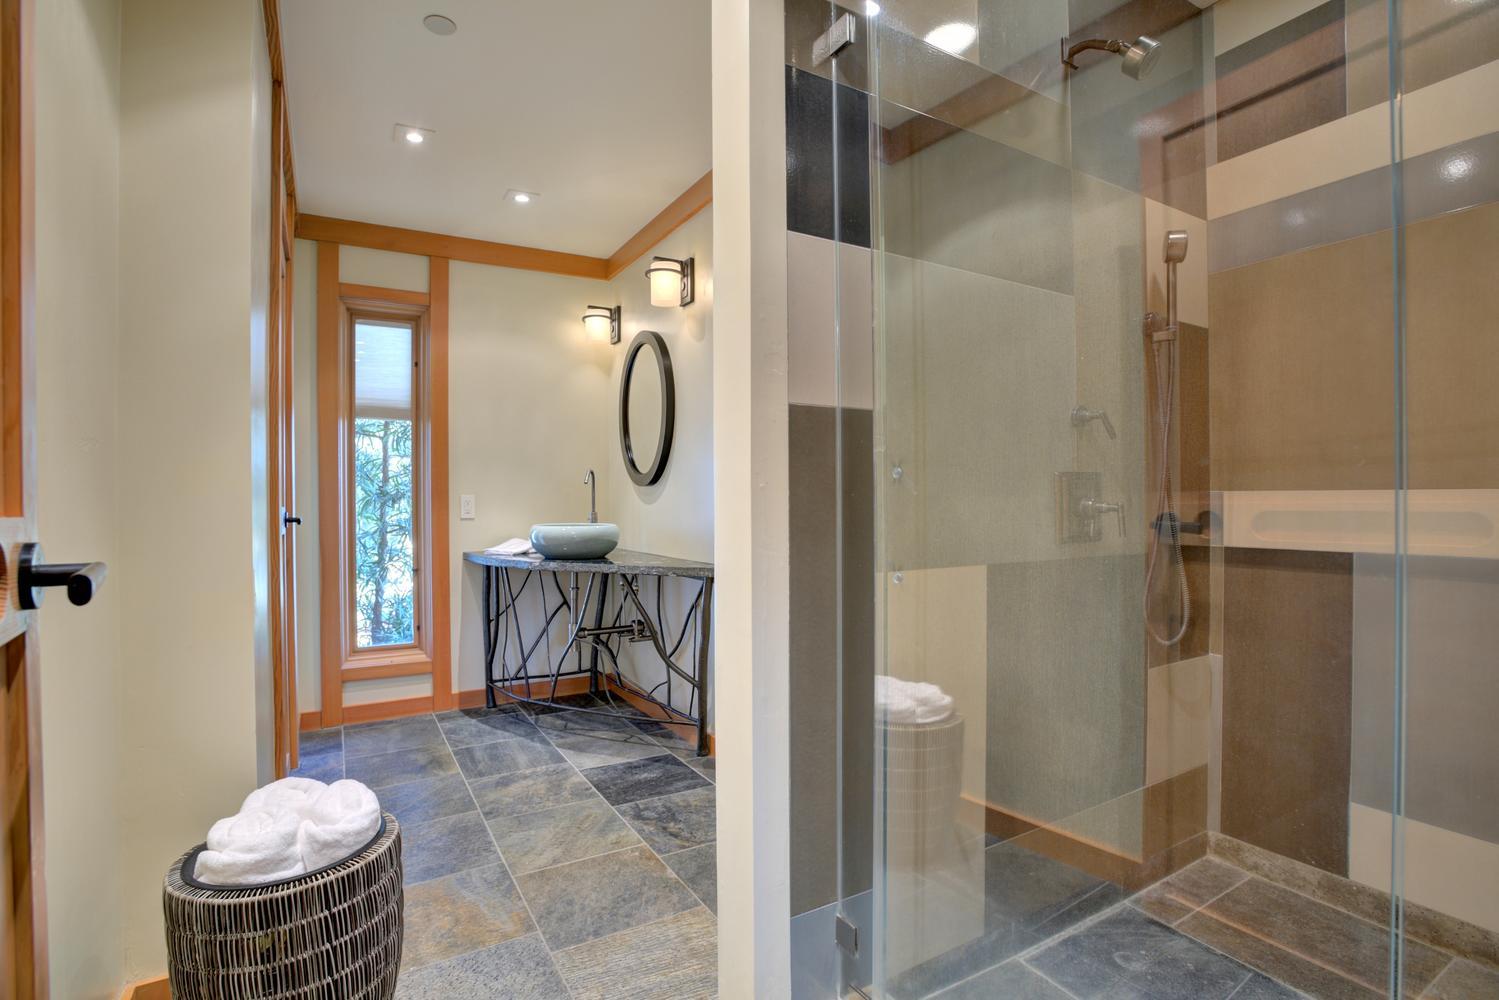 573 More Ave Los Gatos CA-large-022-11-Hall Bathroom-1499x1000-72dpi.jpg